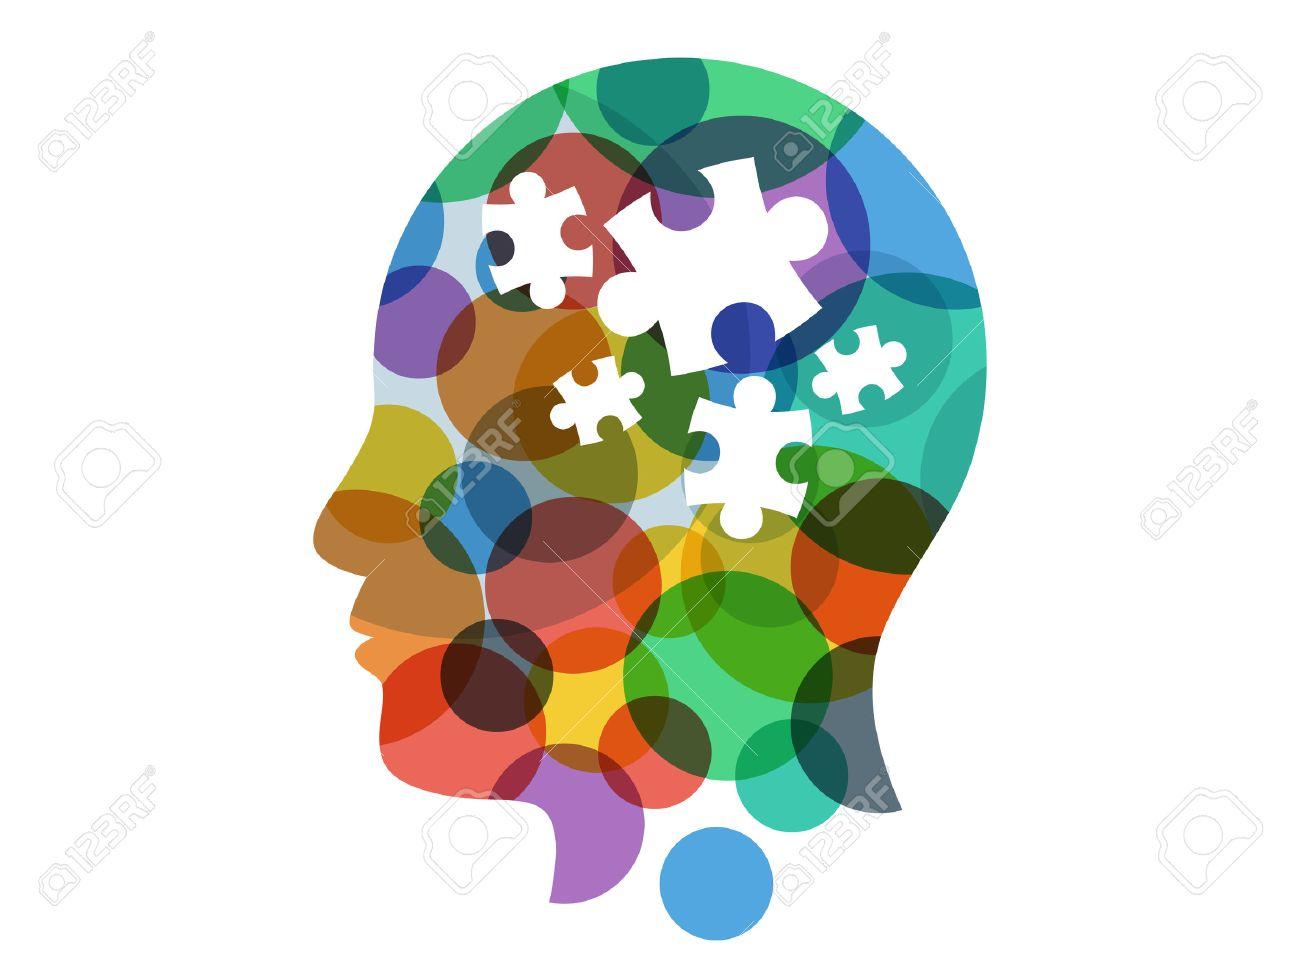 Spectrum puzzle head presentation vector - 30471503